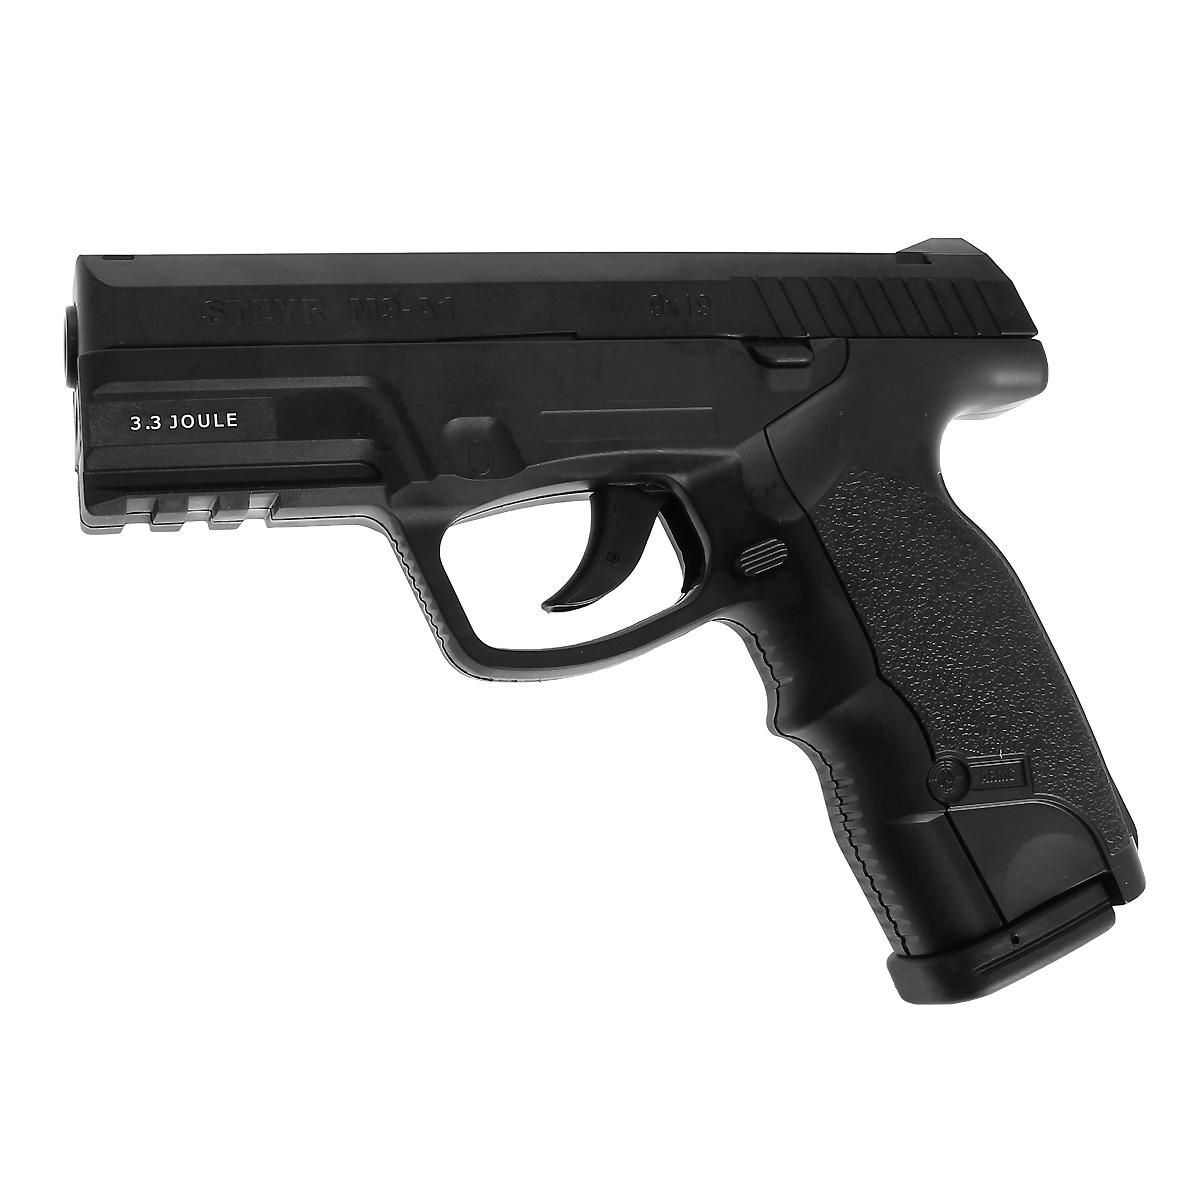 ASG Steyr Mannlicher M9-A1 пистолет пневматический CO2, 4,5 мм, цвет: Black (16088) цена